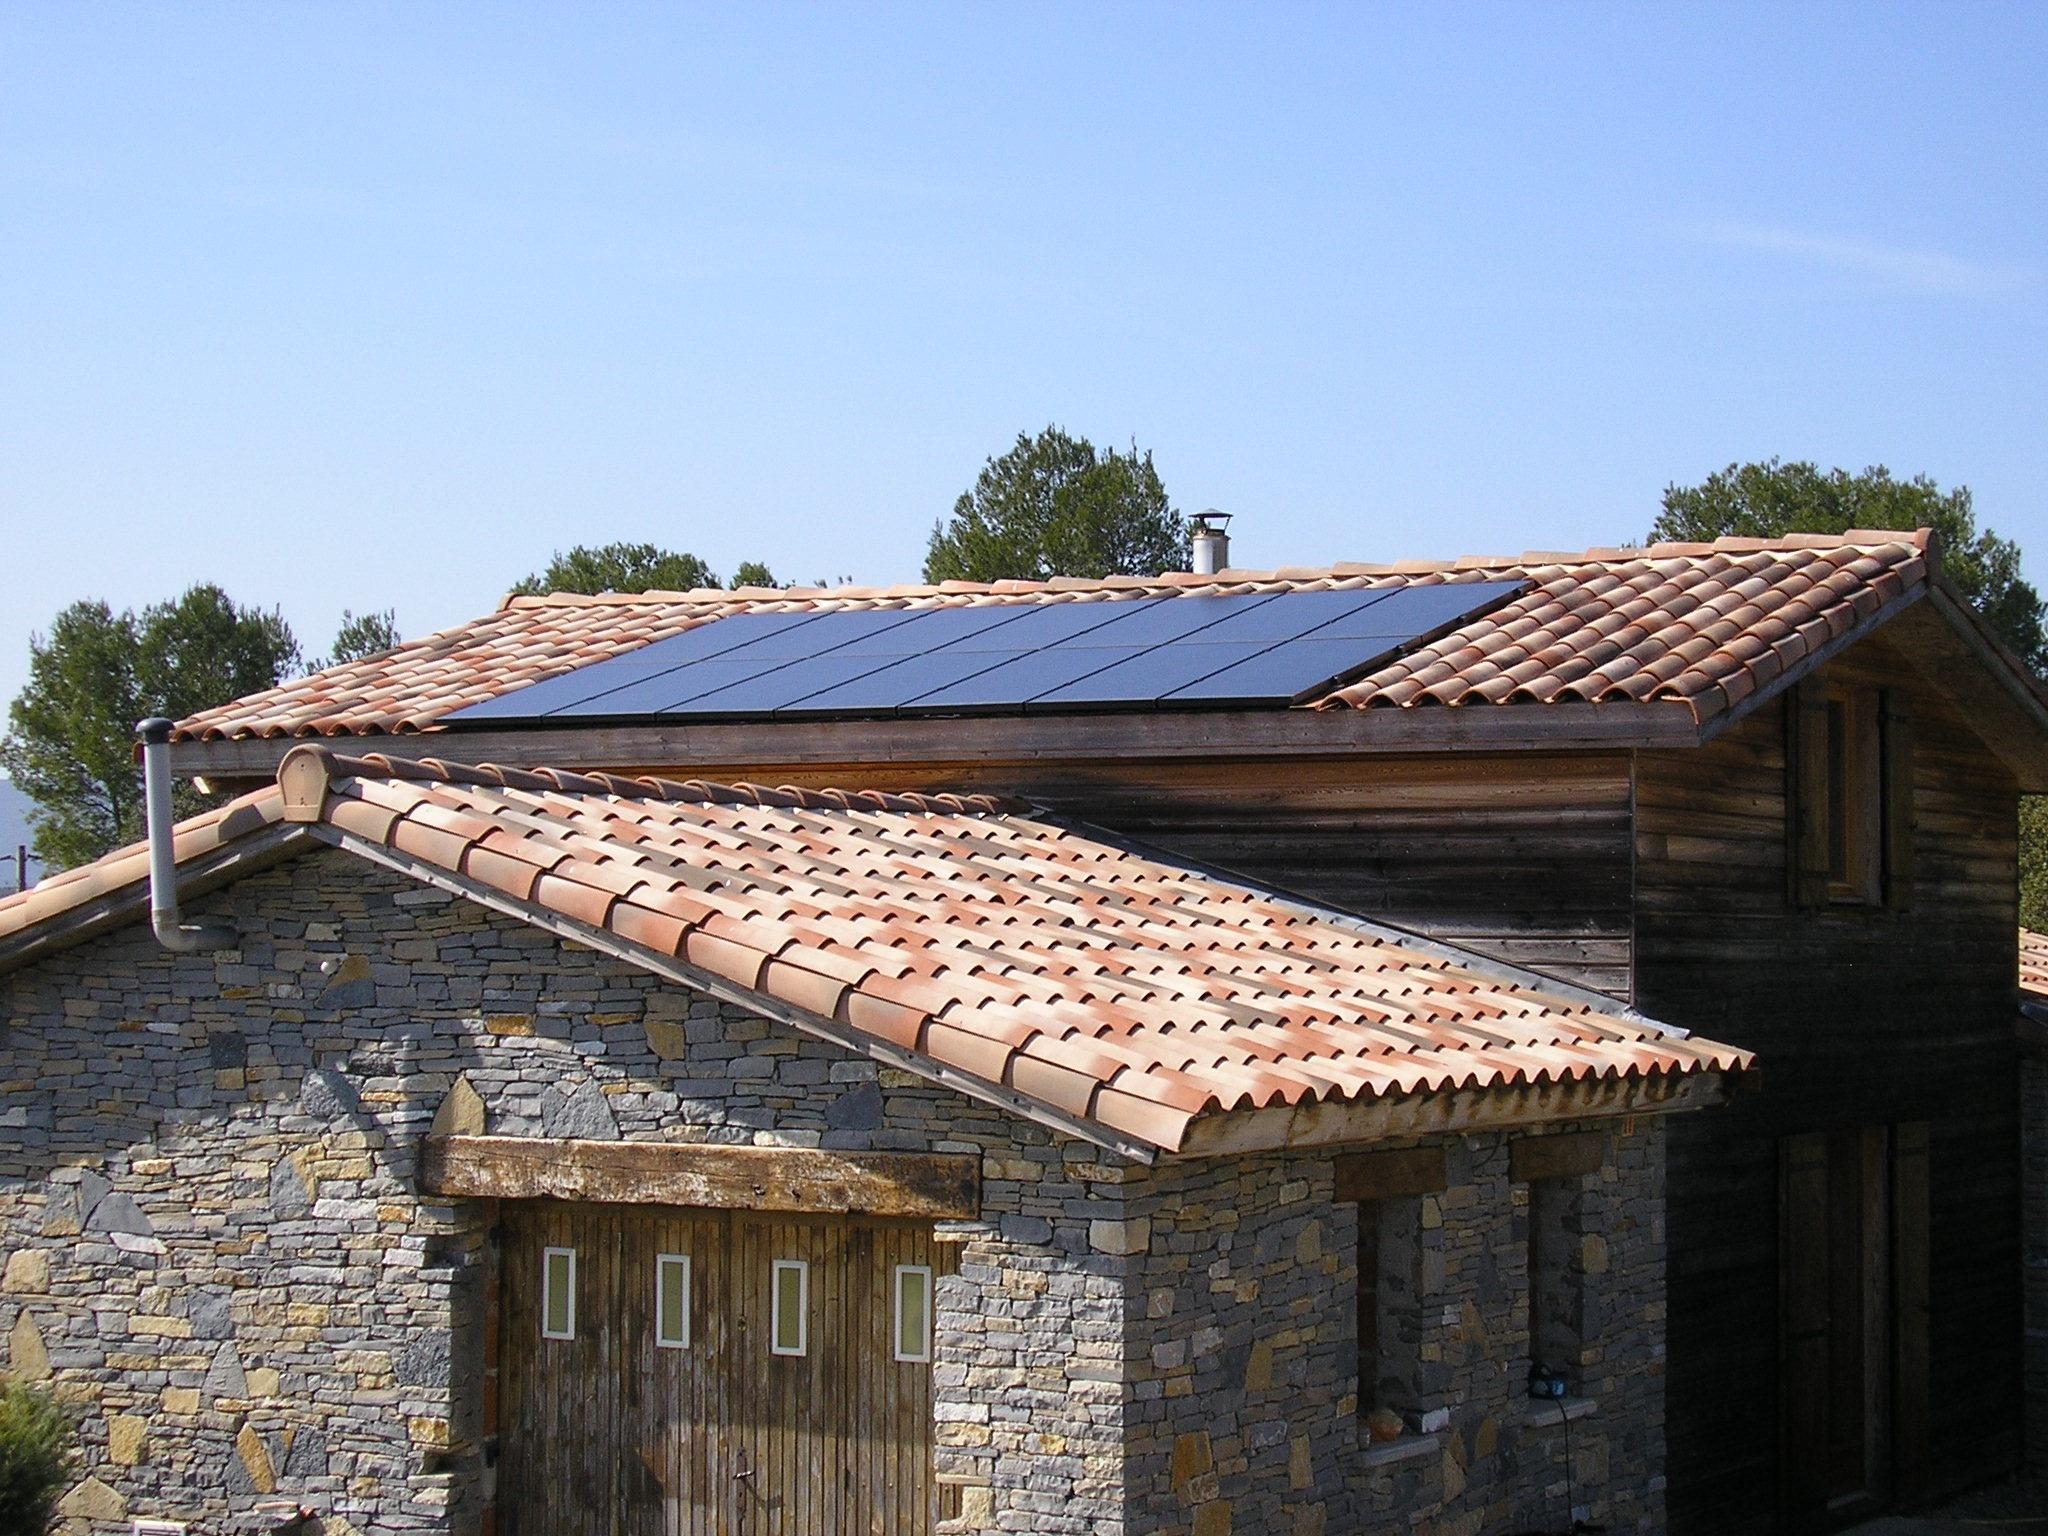 https://static.onlc.eu/natura-energiesNDD//123791303424.jpg